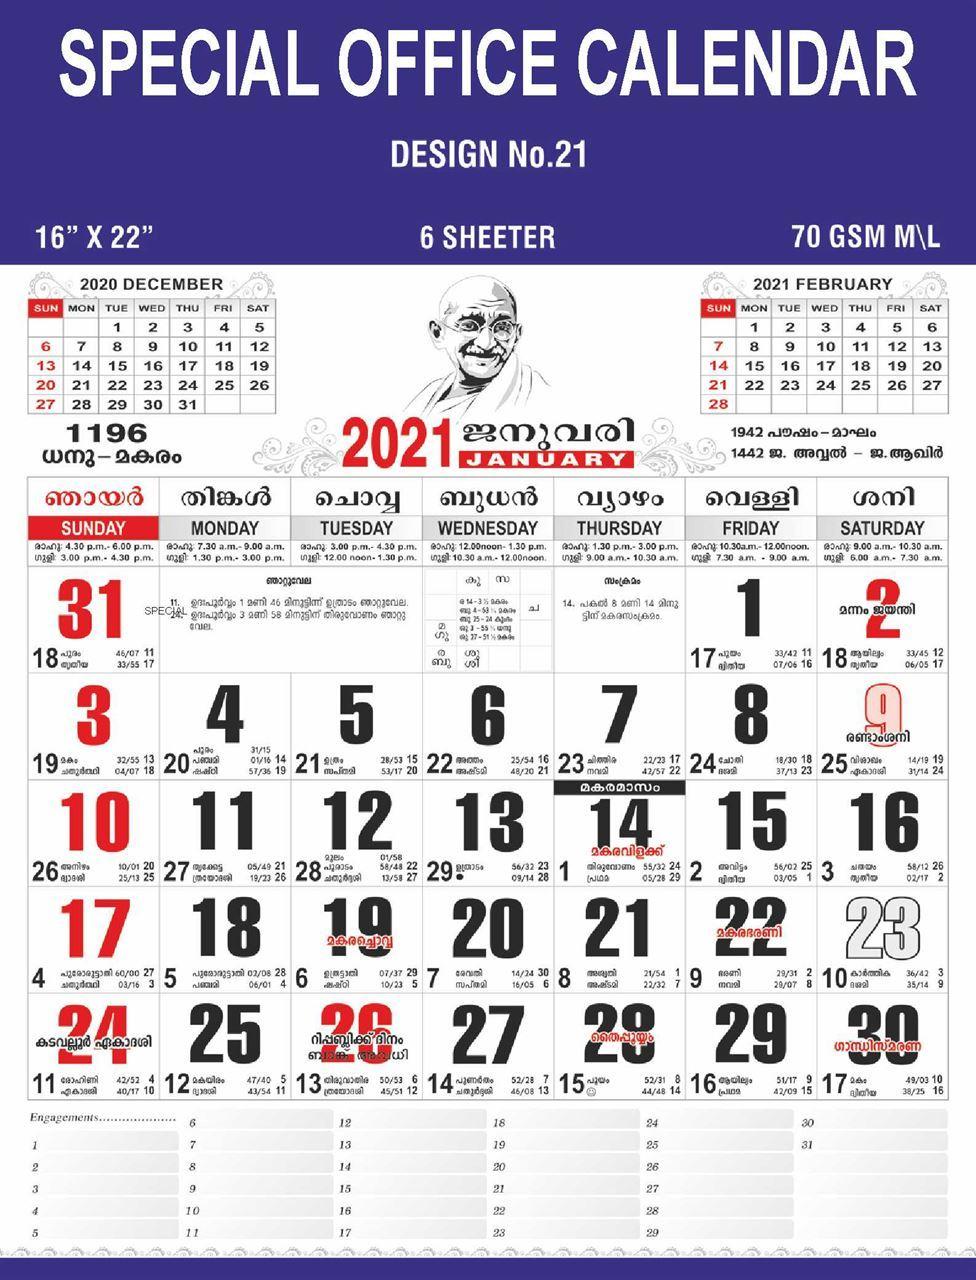 DM21 16X22 Three Sheeter Monthly Calendar Print 2021